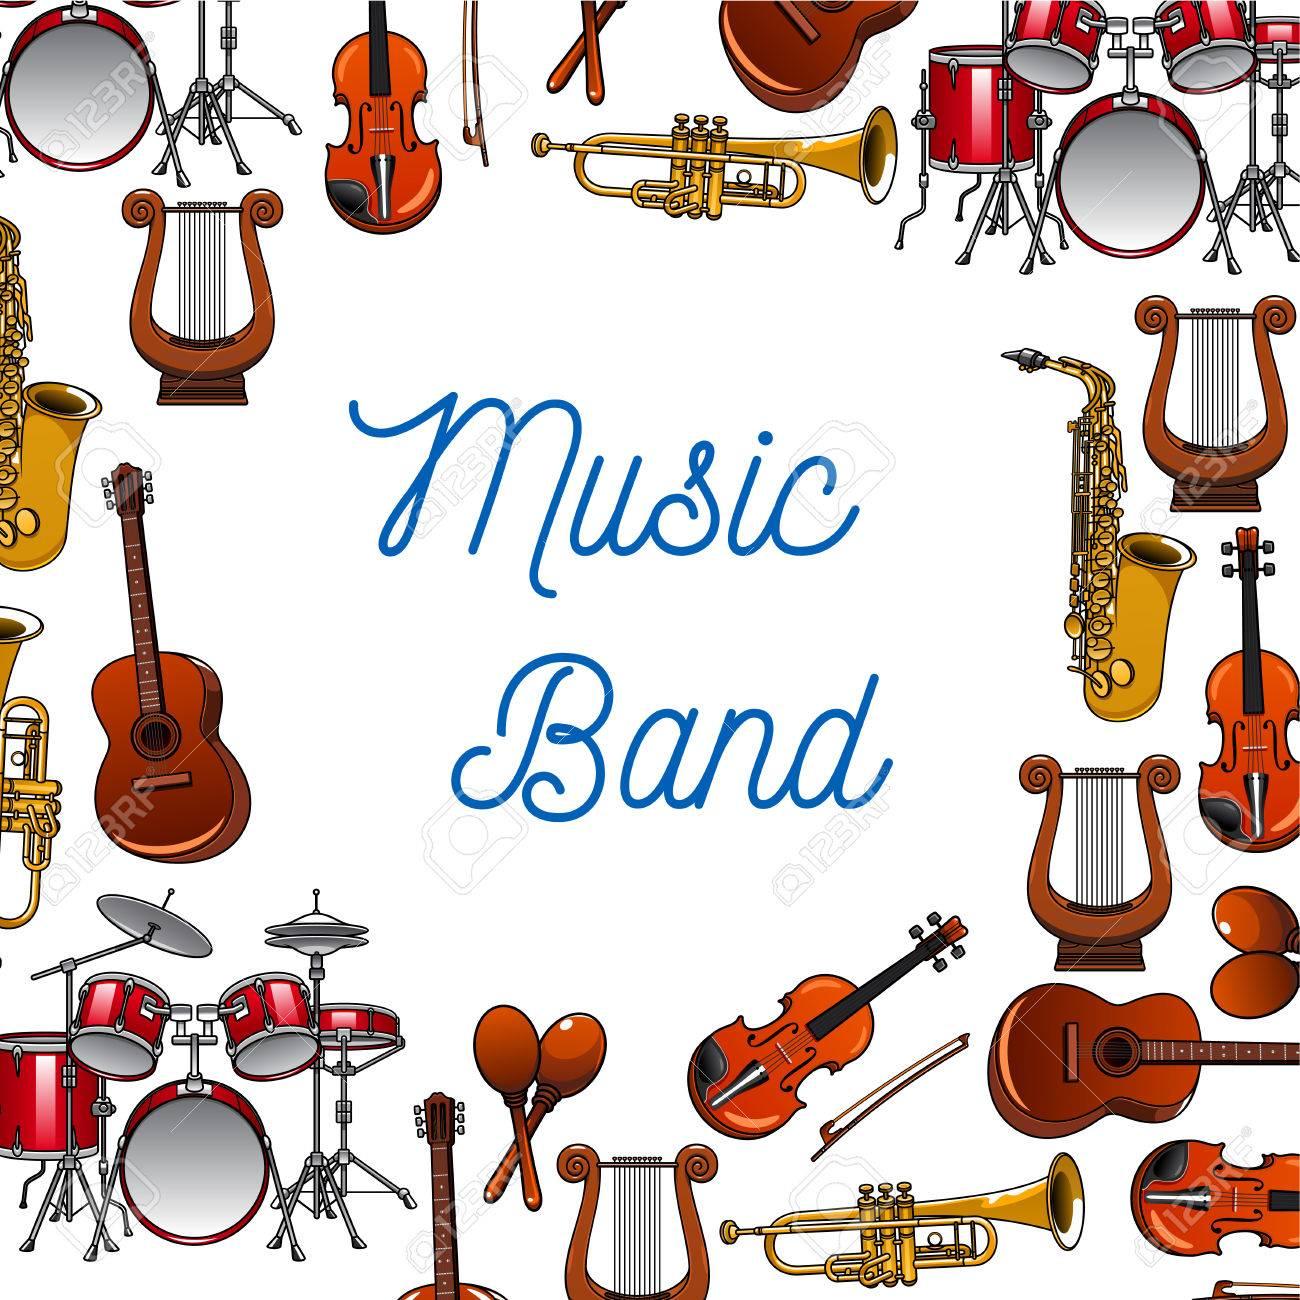 Musical instruments background of guitars, violins, drums, trumpets,